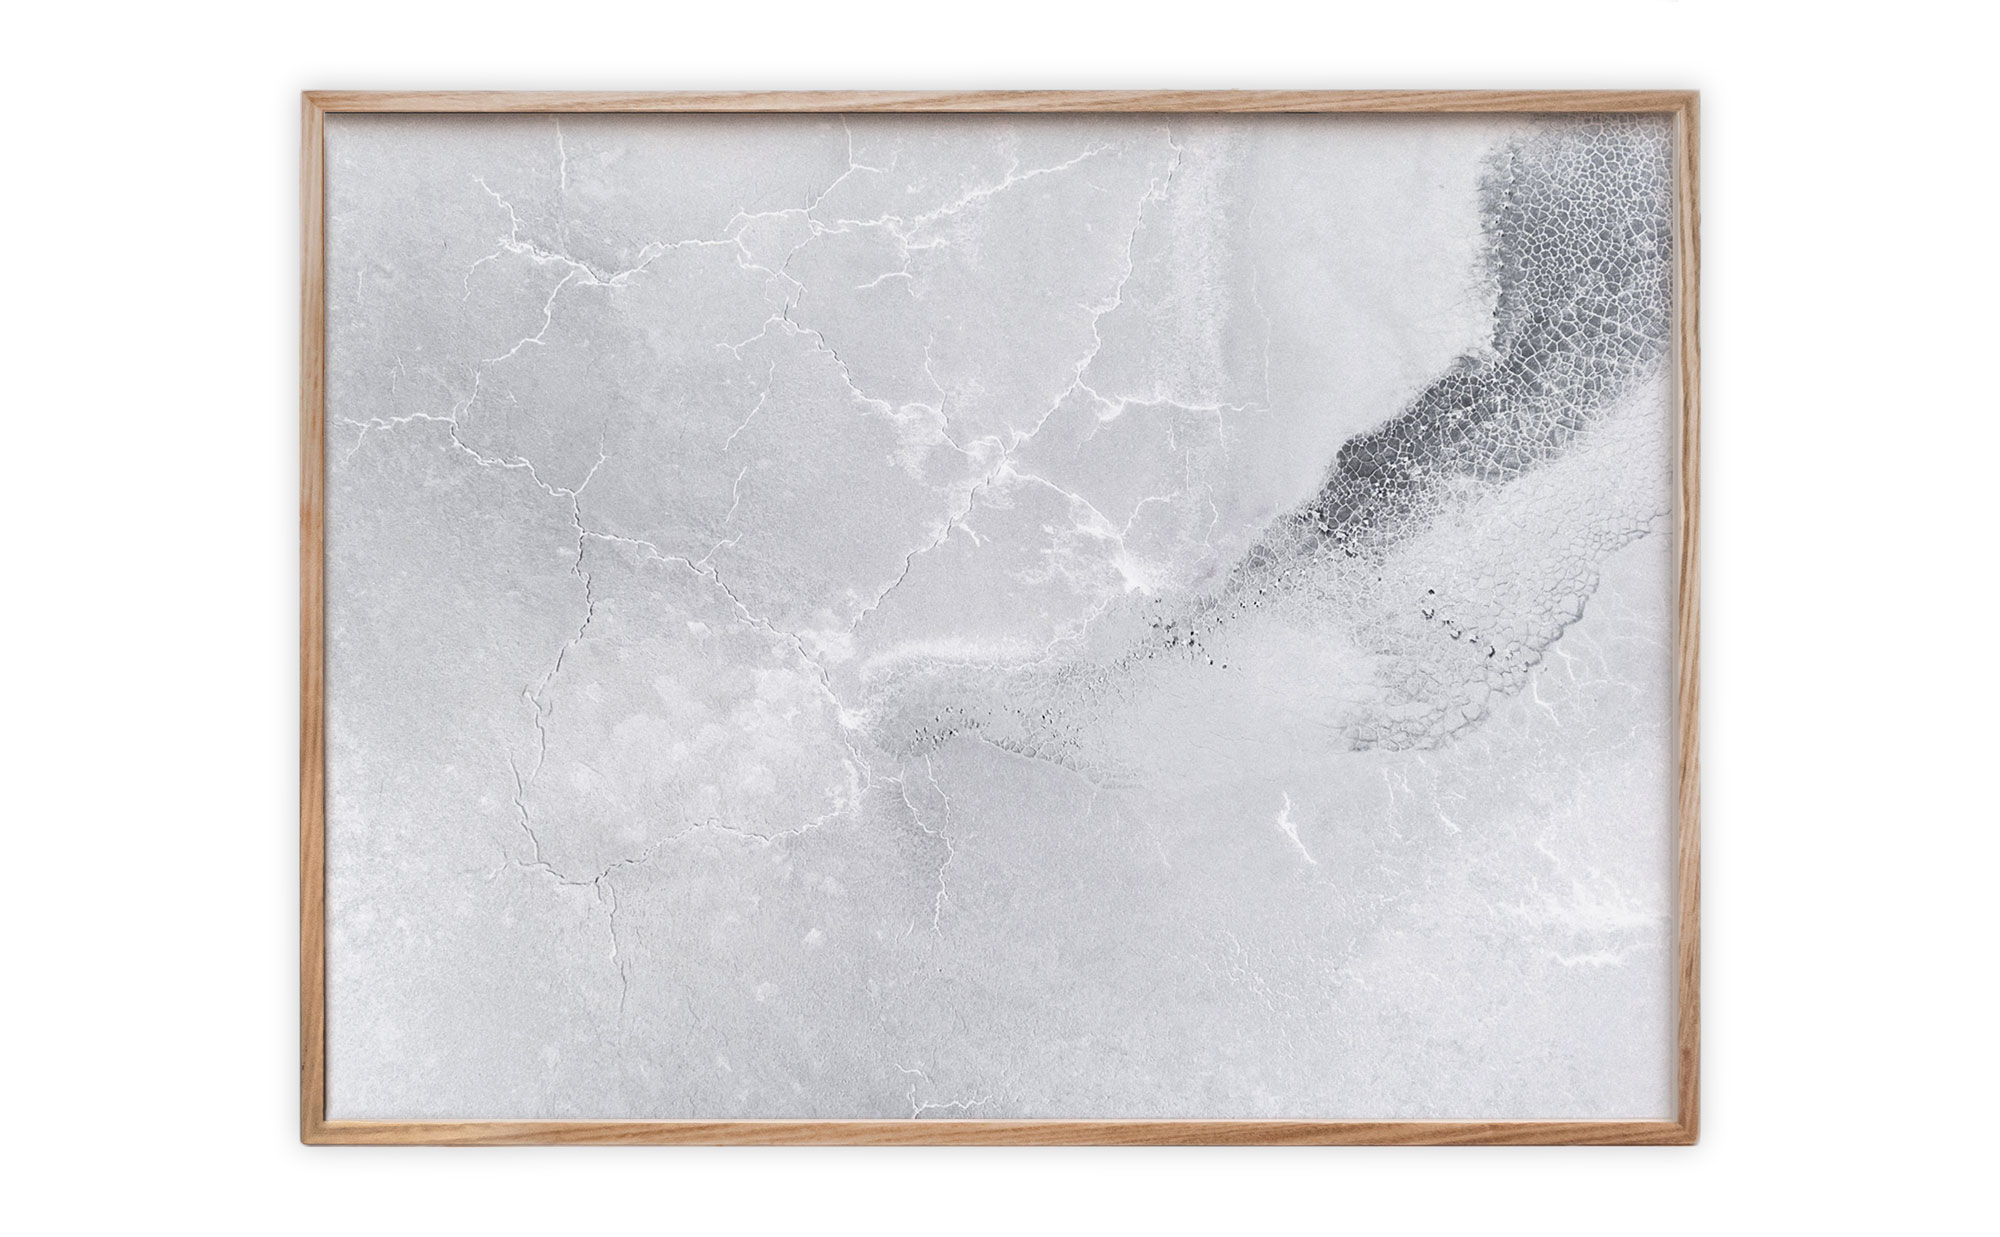 Maegan_Brown_Salt_Stone_04_Framed_Natural.jpg